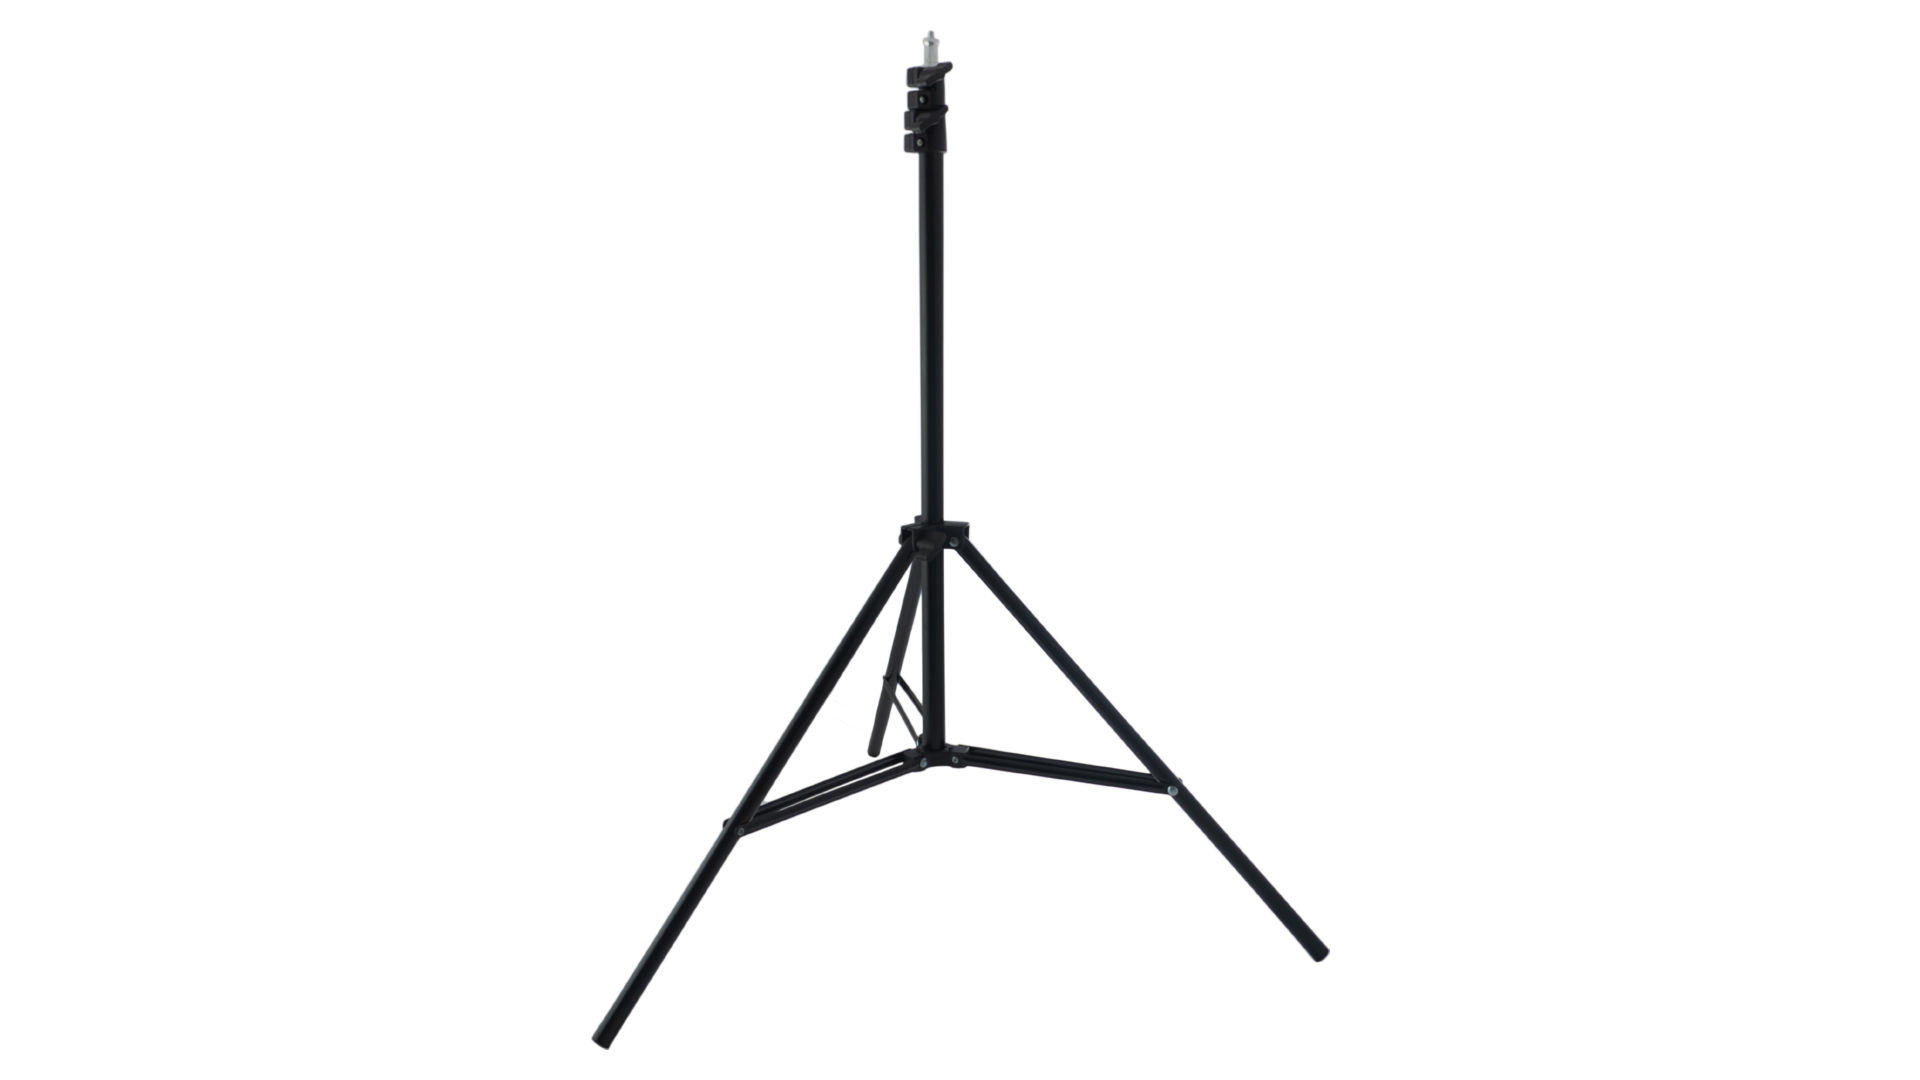 Штатив для лампы кольцевой PRC Tripod - 0,78-1,9 м 5